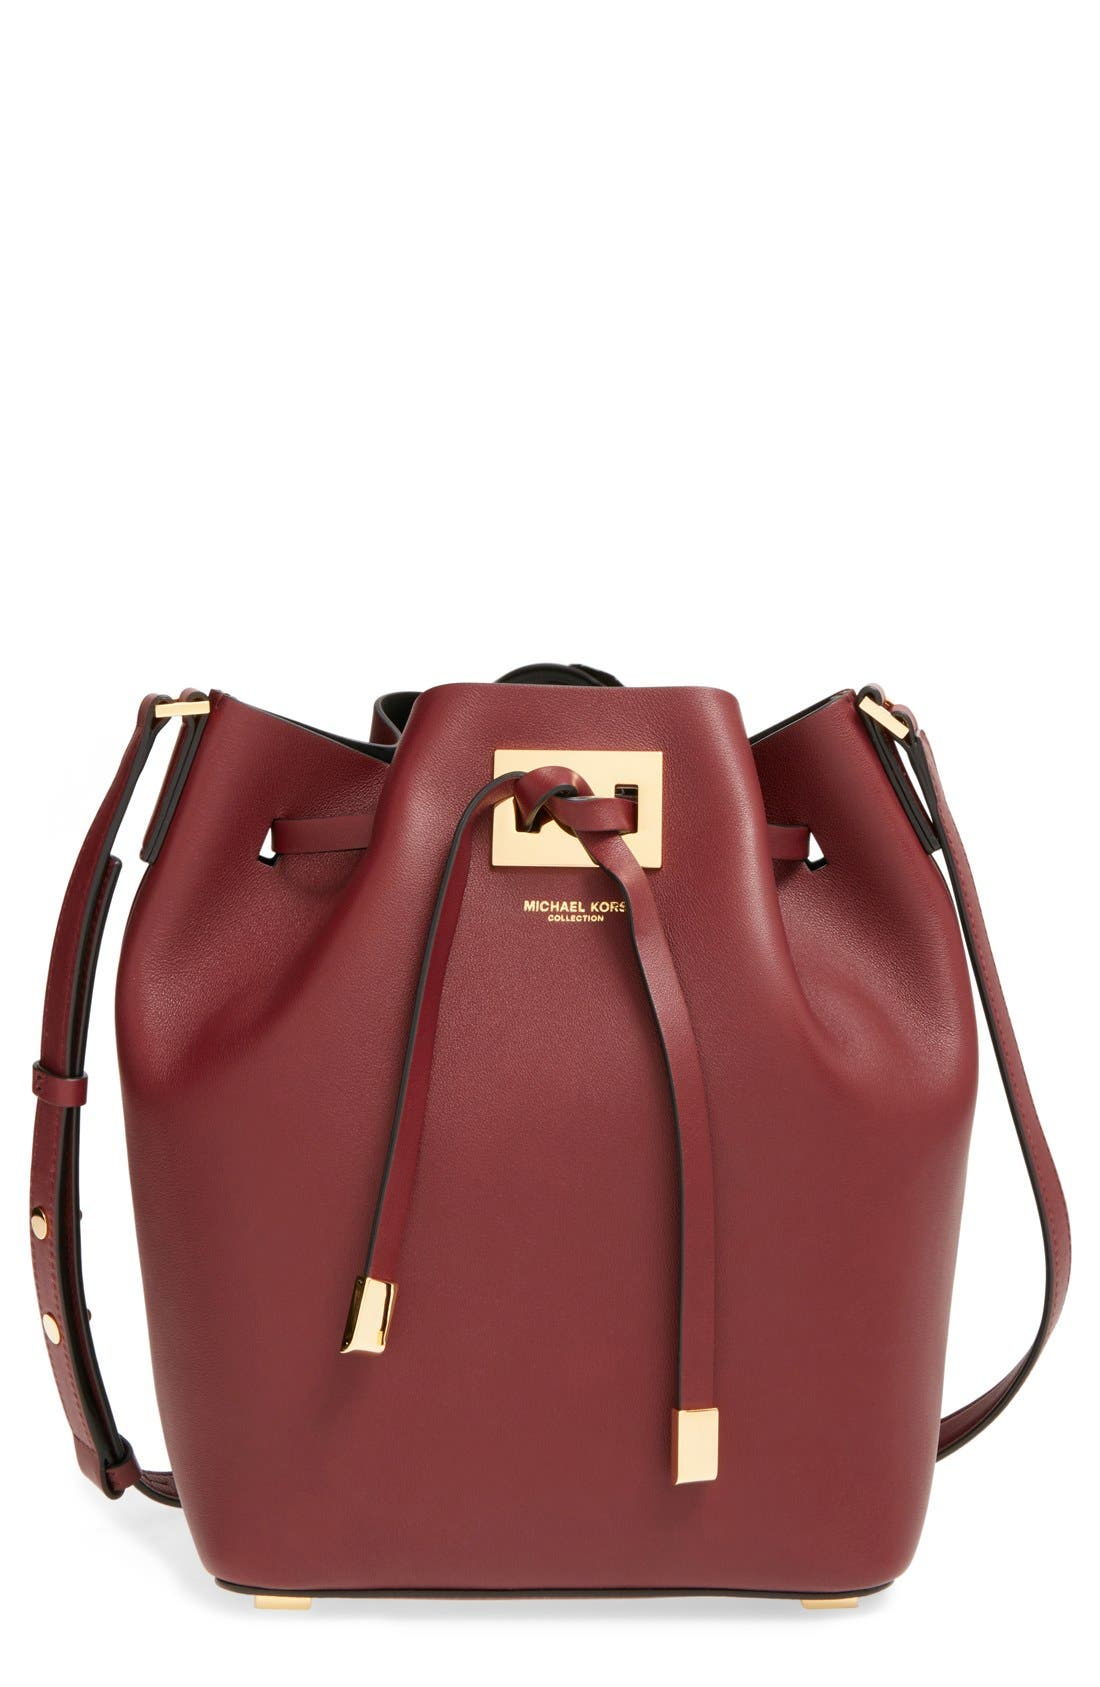 Alternate Image 1 Selected - Michael Kors 'Medium Miranda' Bucket Bag